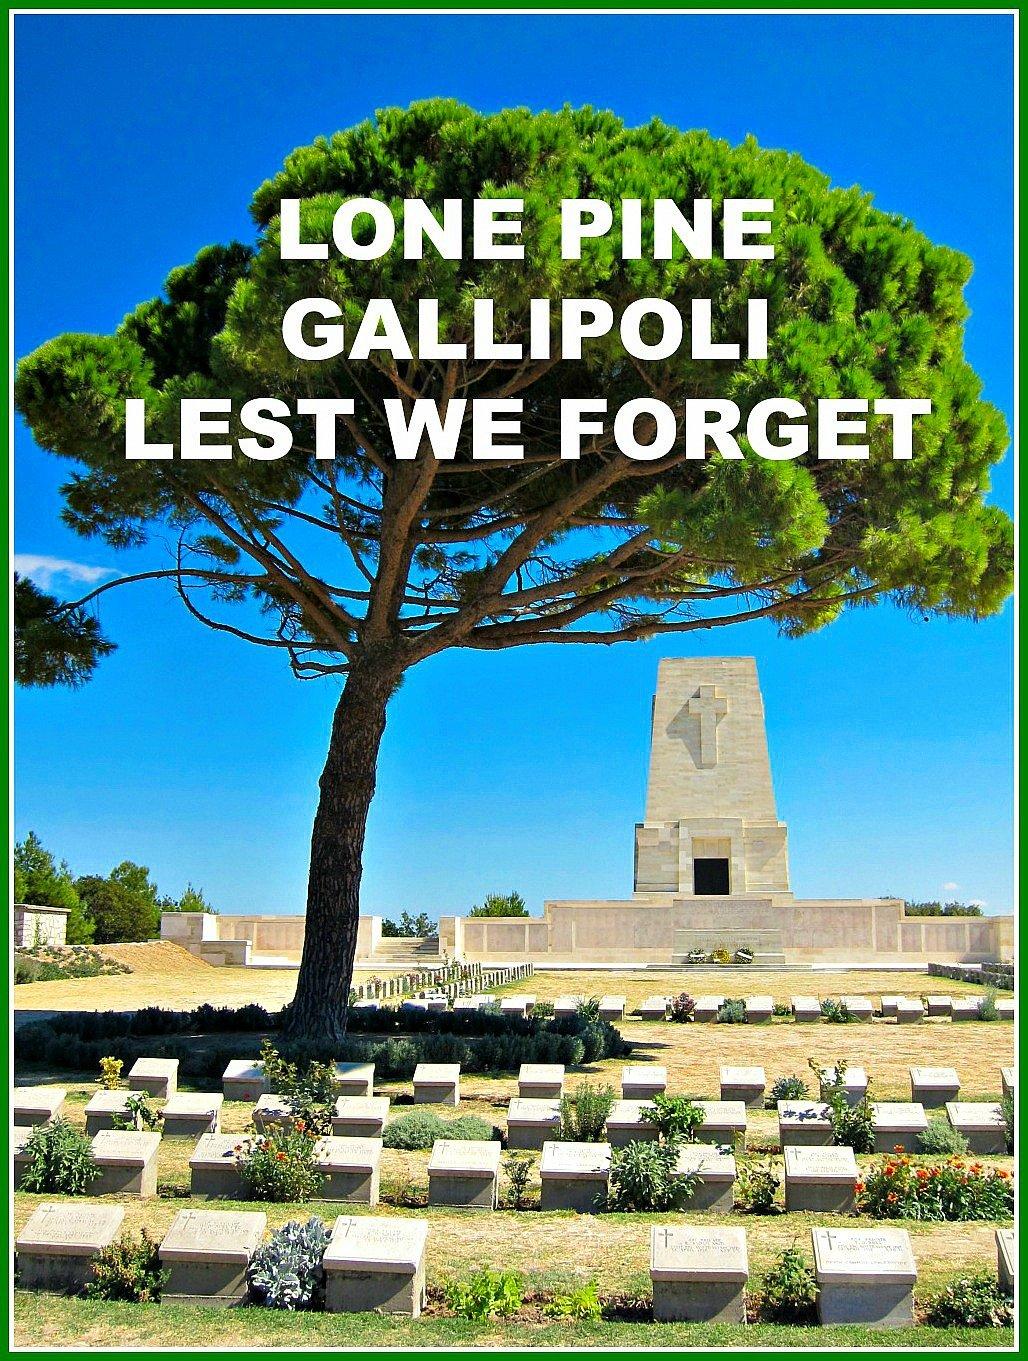 Lone Pine Gallipoli Lest We Forget